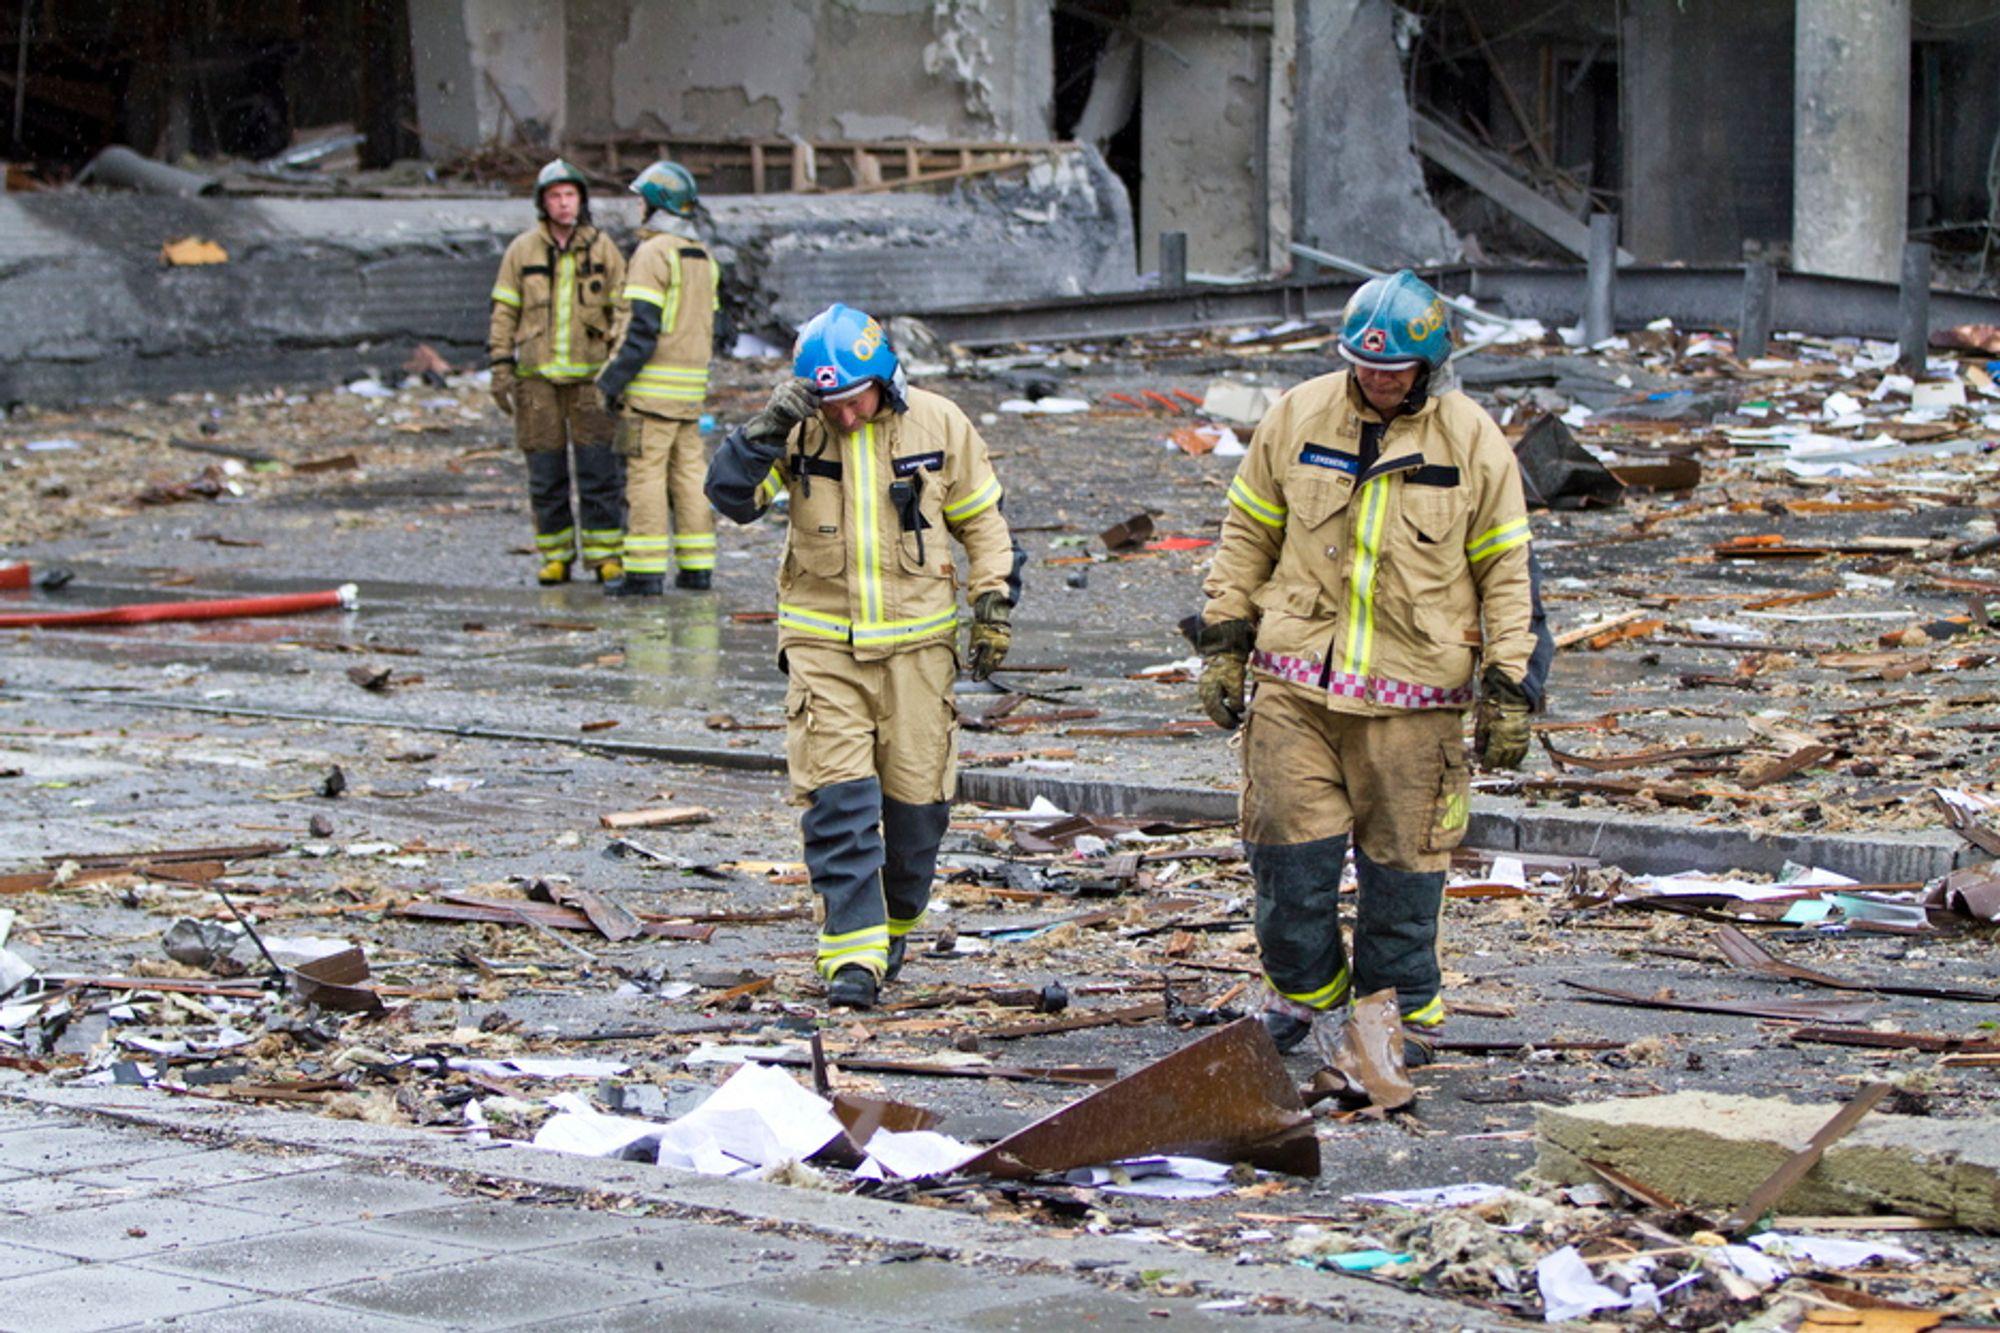 Det var en svært kraftig bombe som sprengte i Regjeringskvartalet.